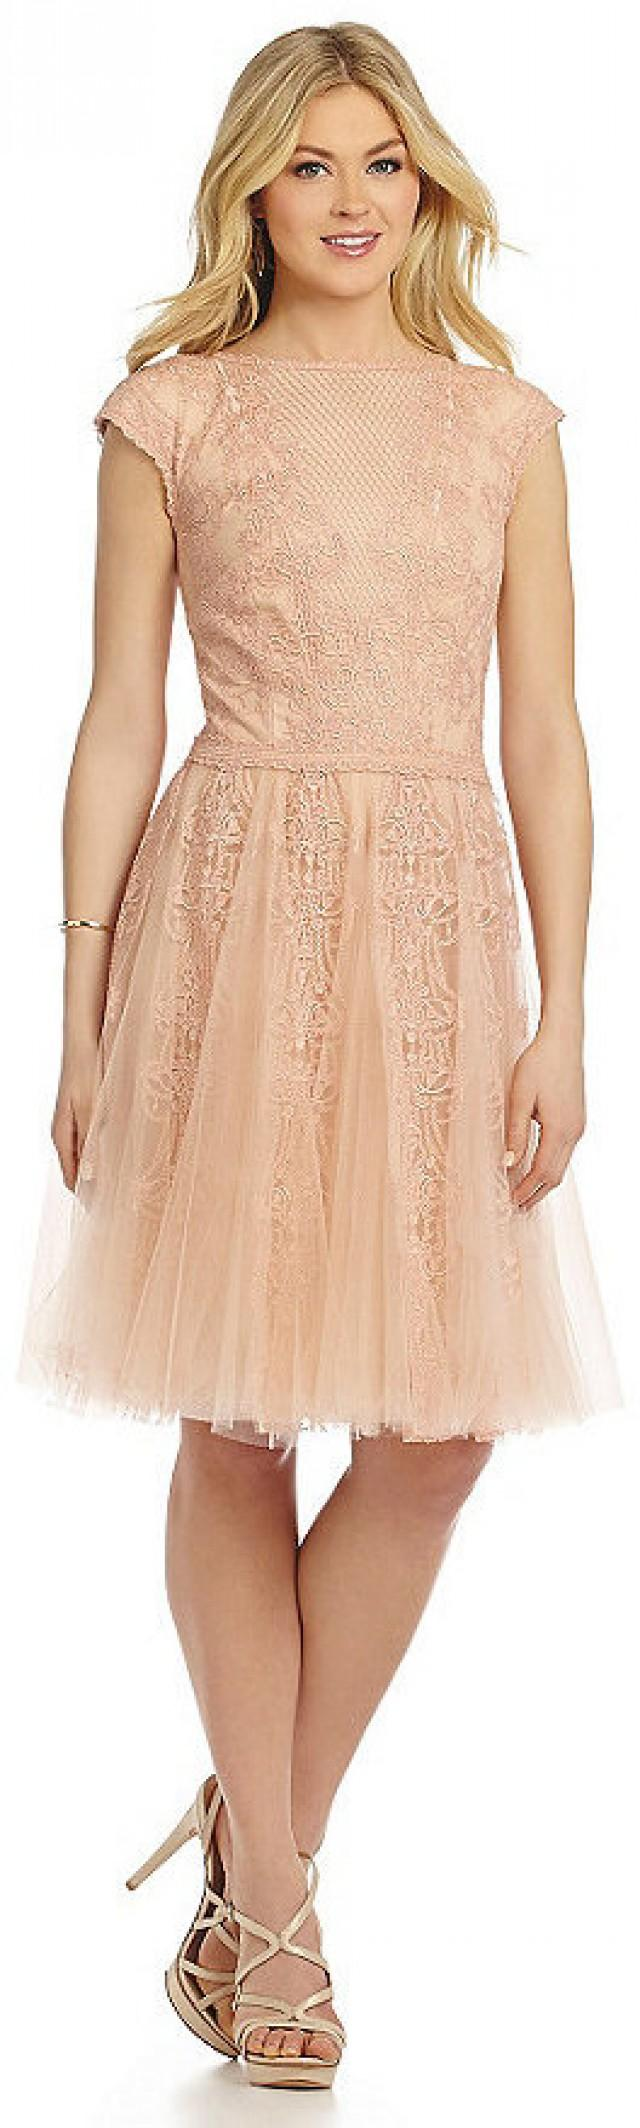 dfe1d04efb70 Tadashi Shoji Tulle Lace Tea-Length Dress #2366117 - Weddbook